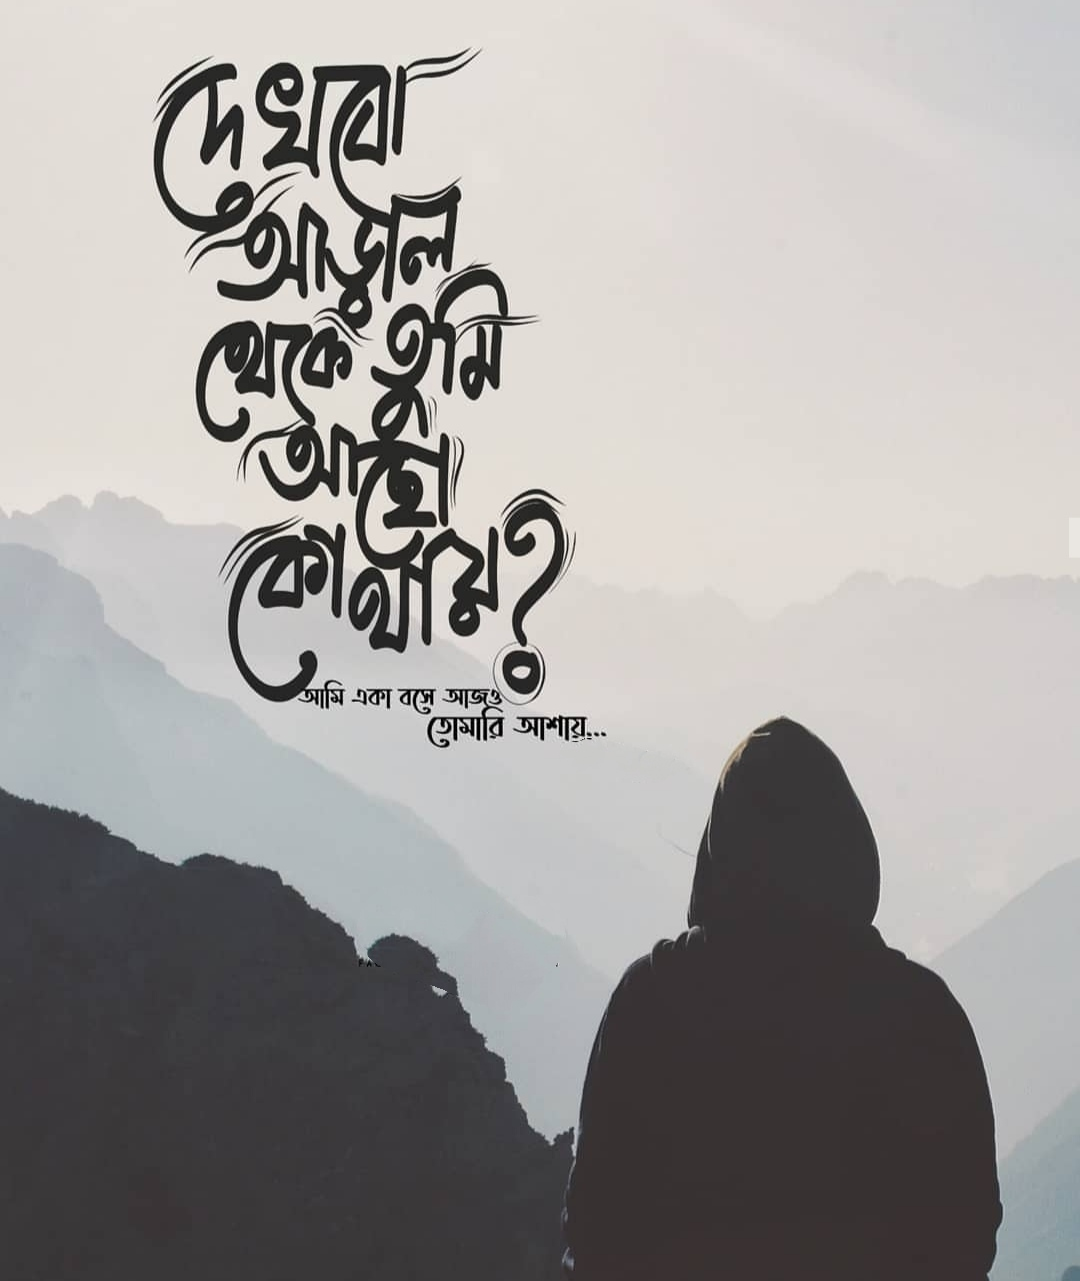 40+ Best Bengali Sad Status & quotes For Facebook, What's app -  40 টি সেরা কষ্টের স্ট্যাটাস - Best Very Sad Quotes for fb